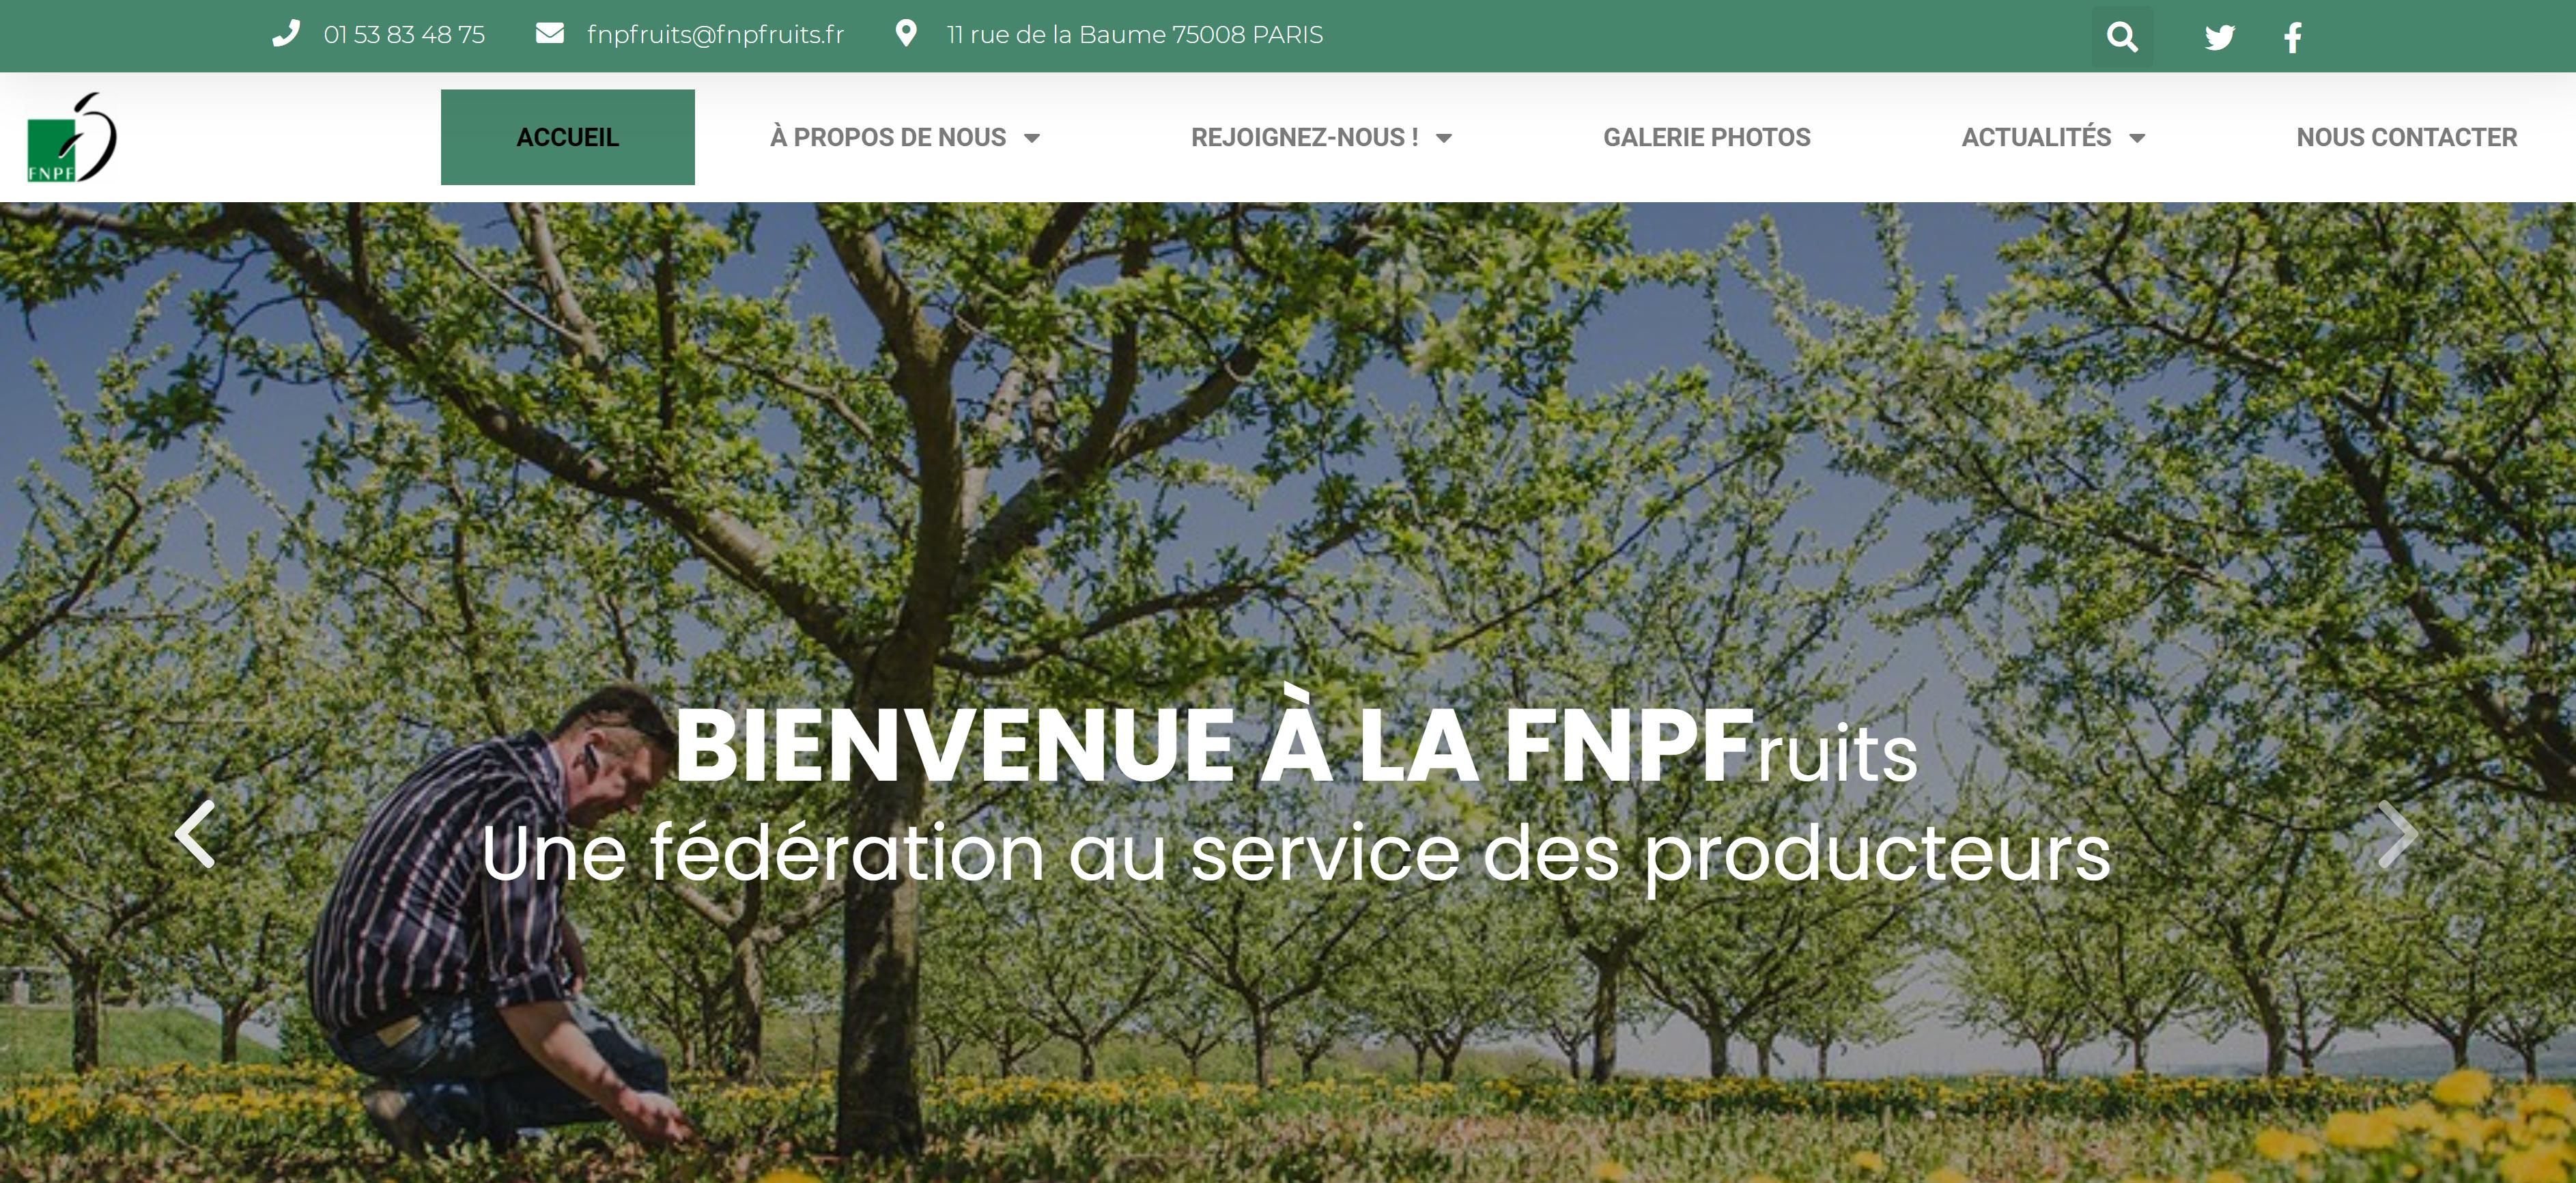 Site FNPF Accueil - Mathis BEHAEGEL